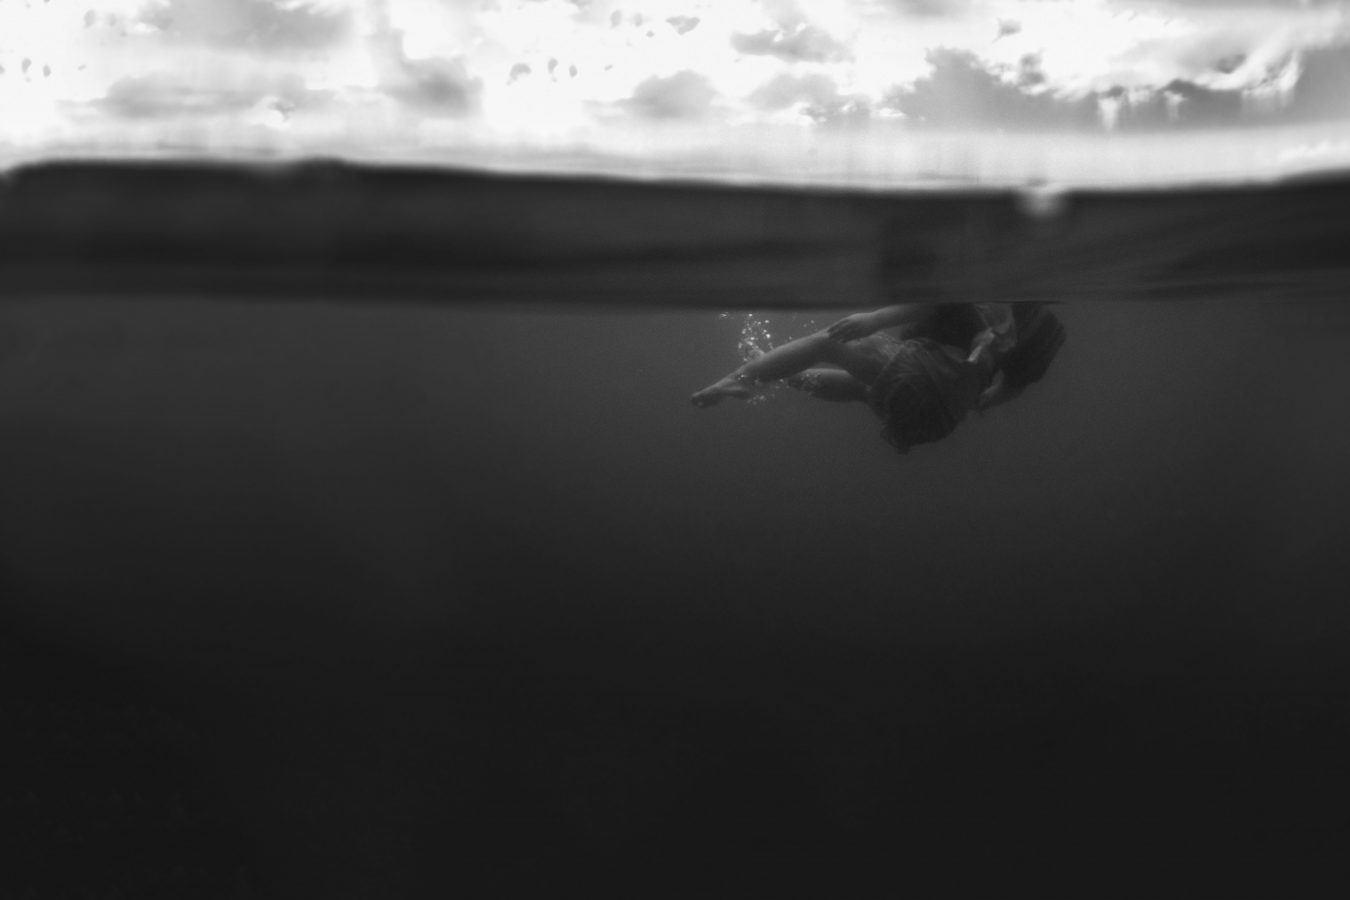 spokane-photographer-environmental-portrait-1